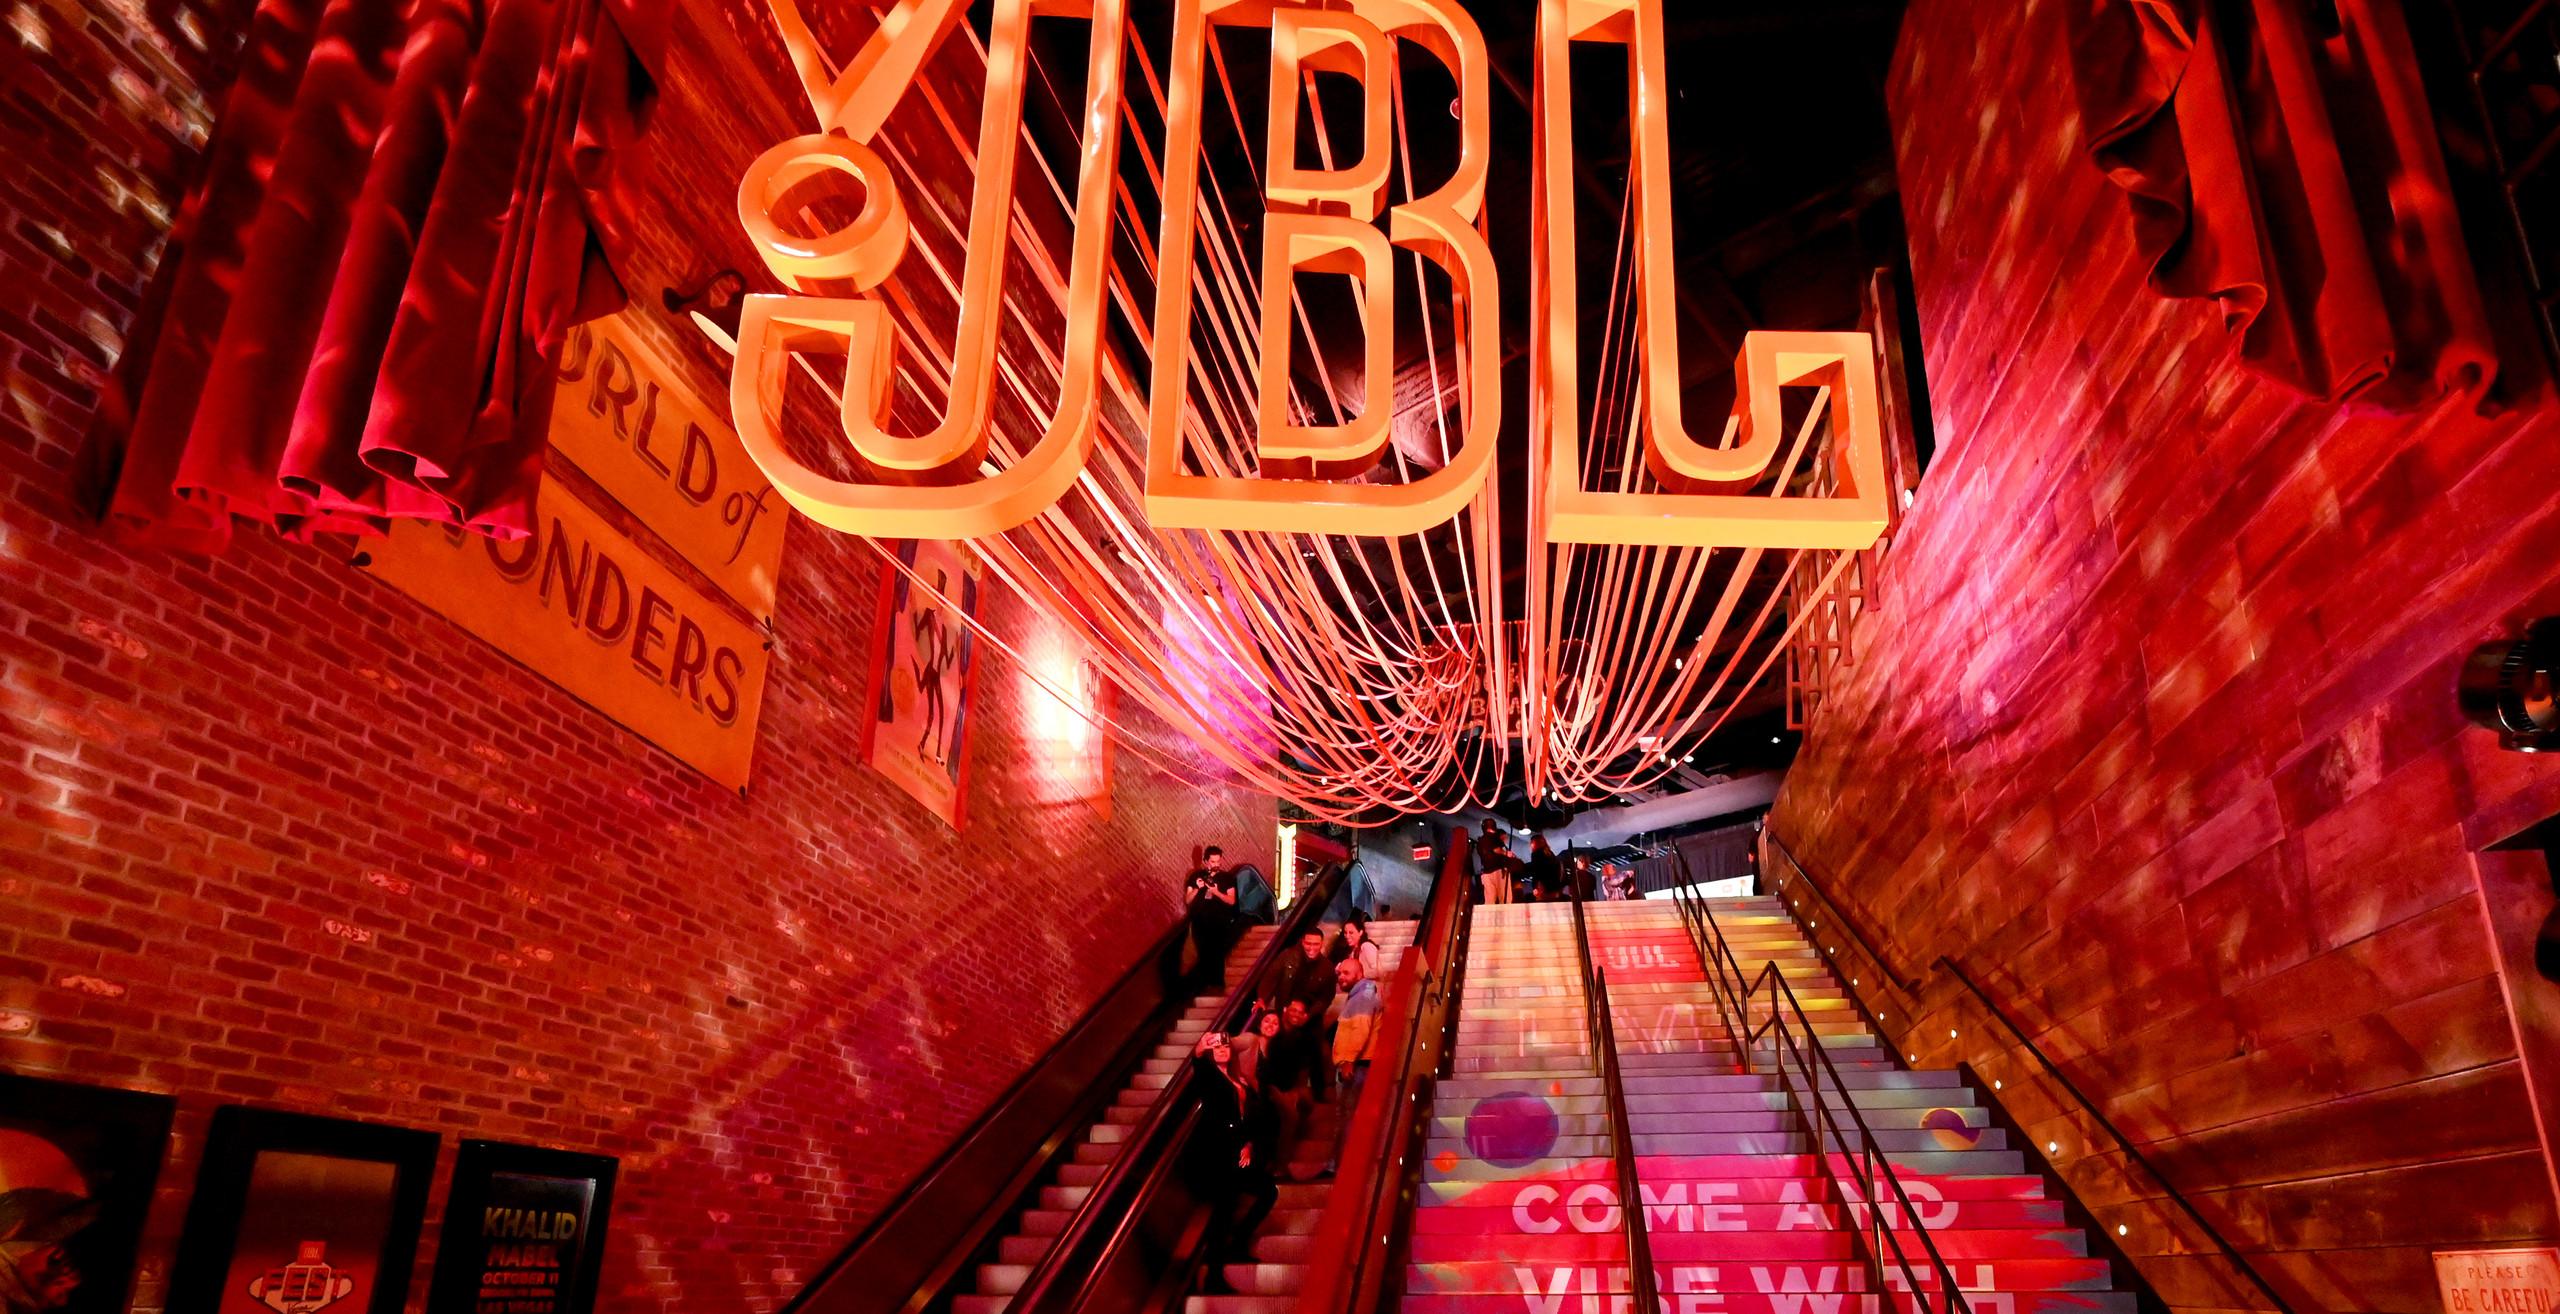 JBL Fest Brooklyn Bowl Las Vegas